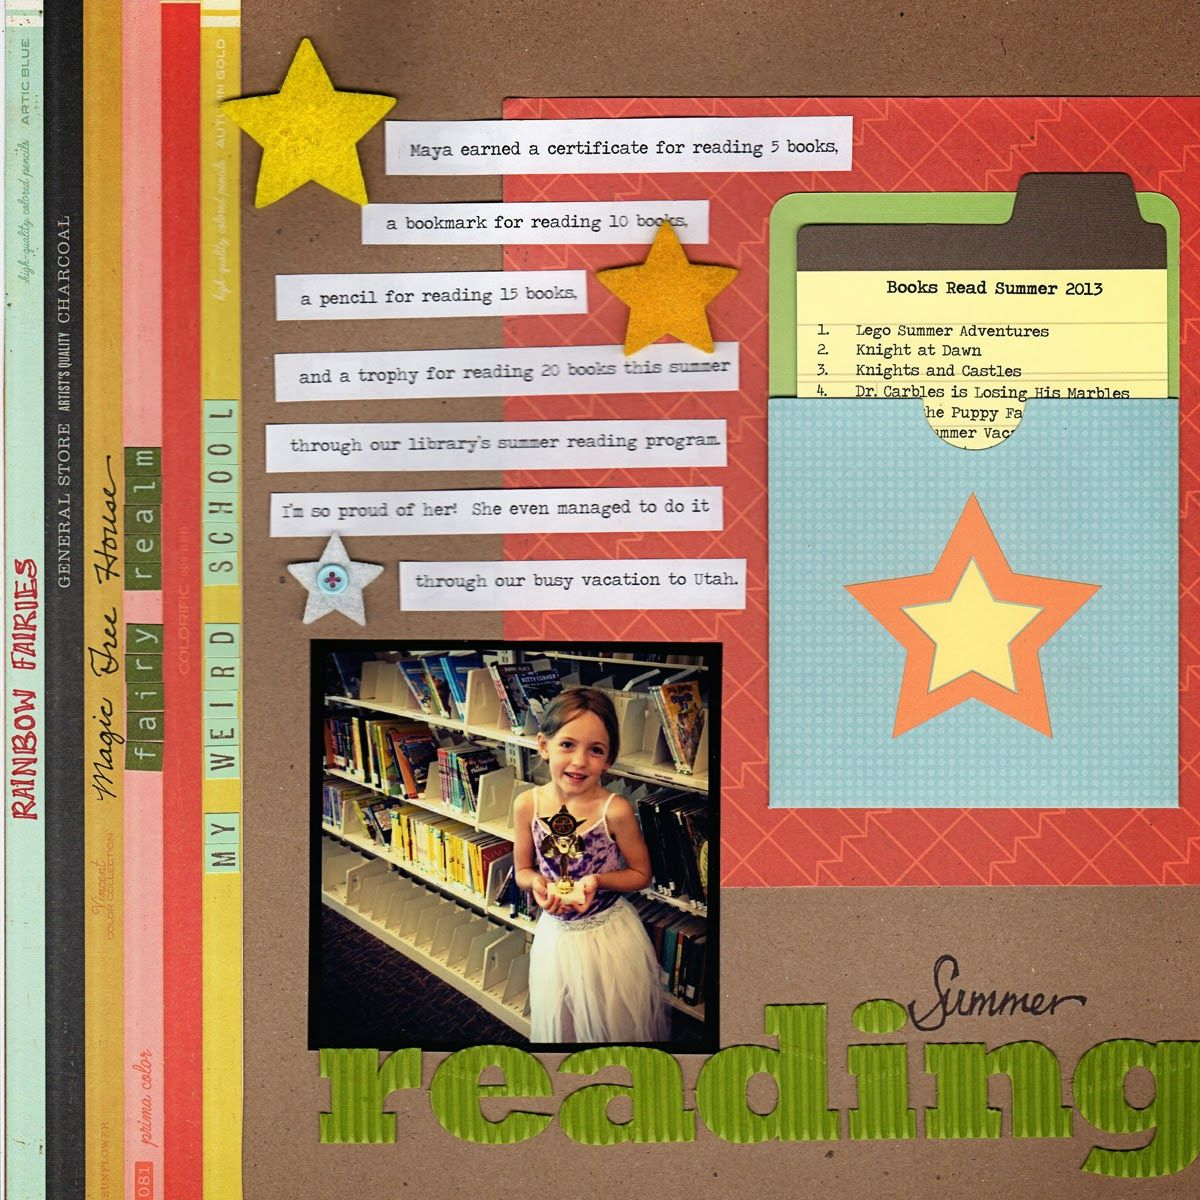 Scrapbook ideas list - Scraps Of Shirlee Reading Scrapbook Page Book List Layout